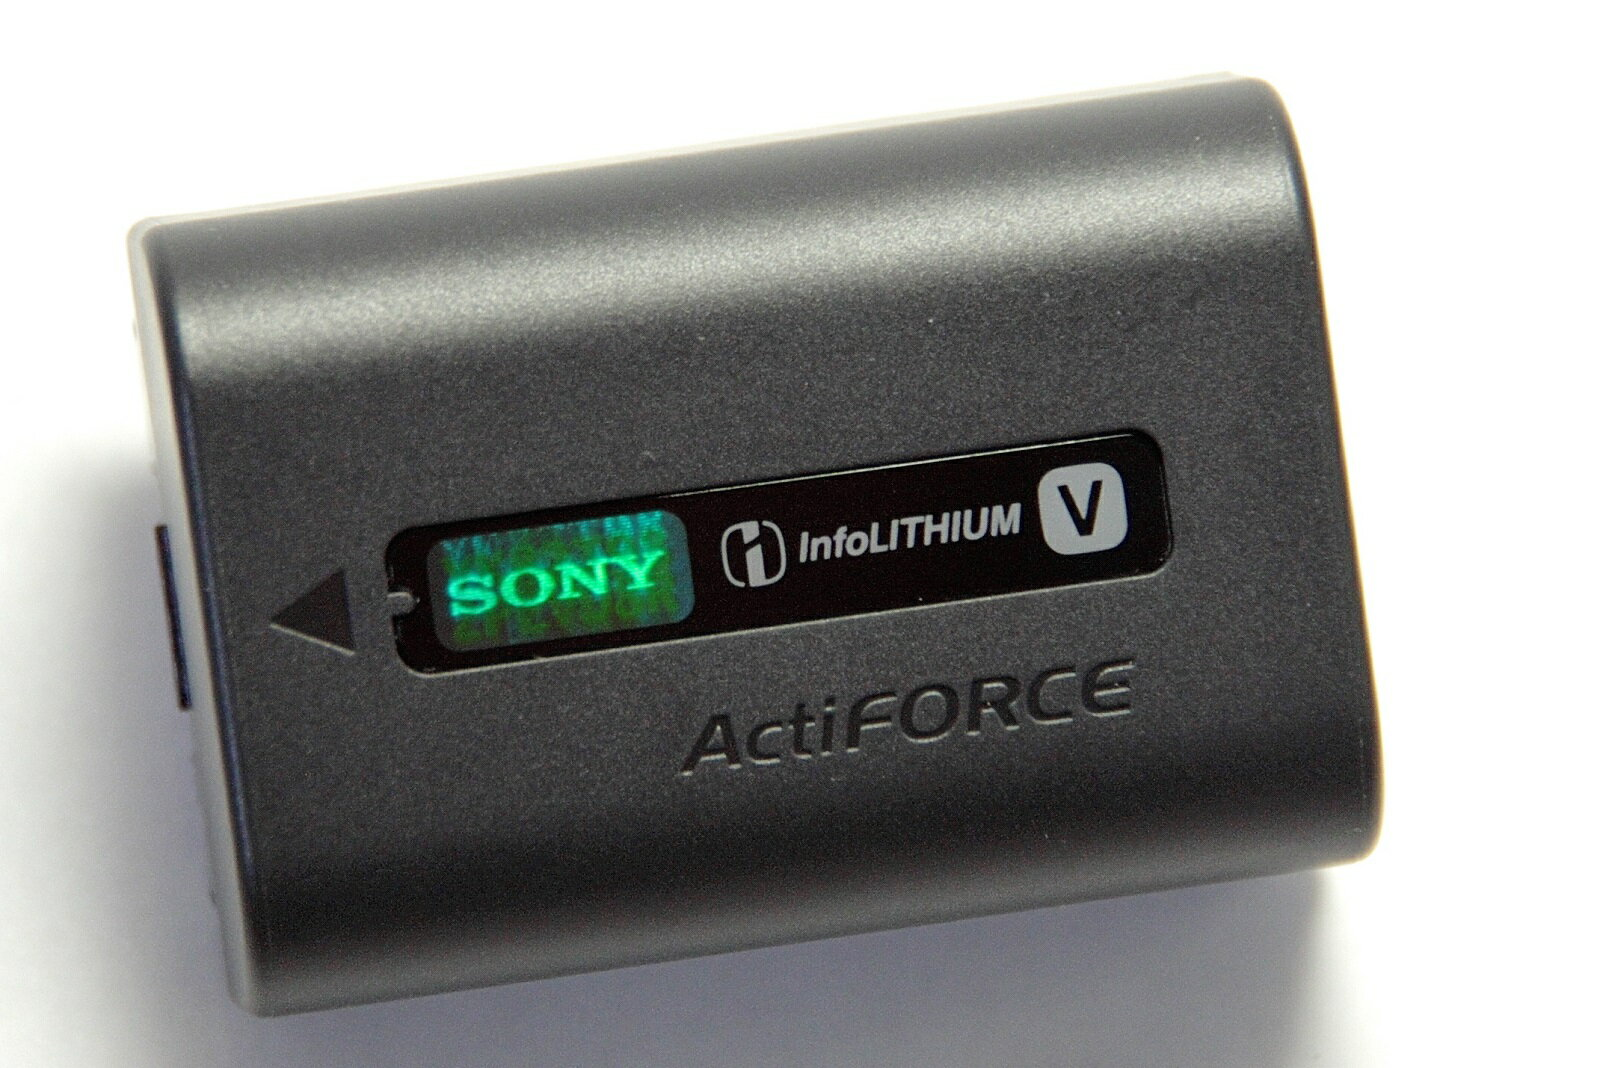 SONY ソニー NP-FV50  純正ホログラム付き・新デザイン版 送料無料・あす楽対応【メール便】カメラバッテリー 充電池